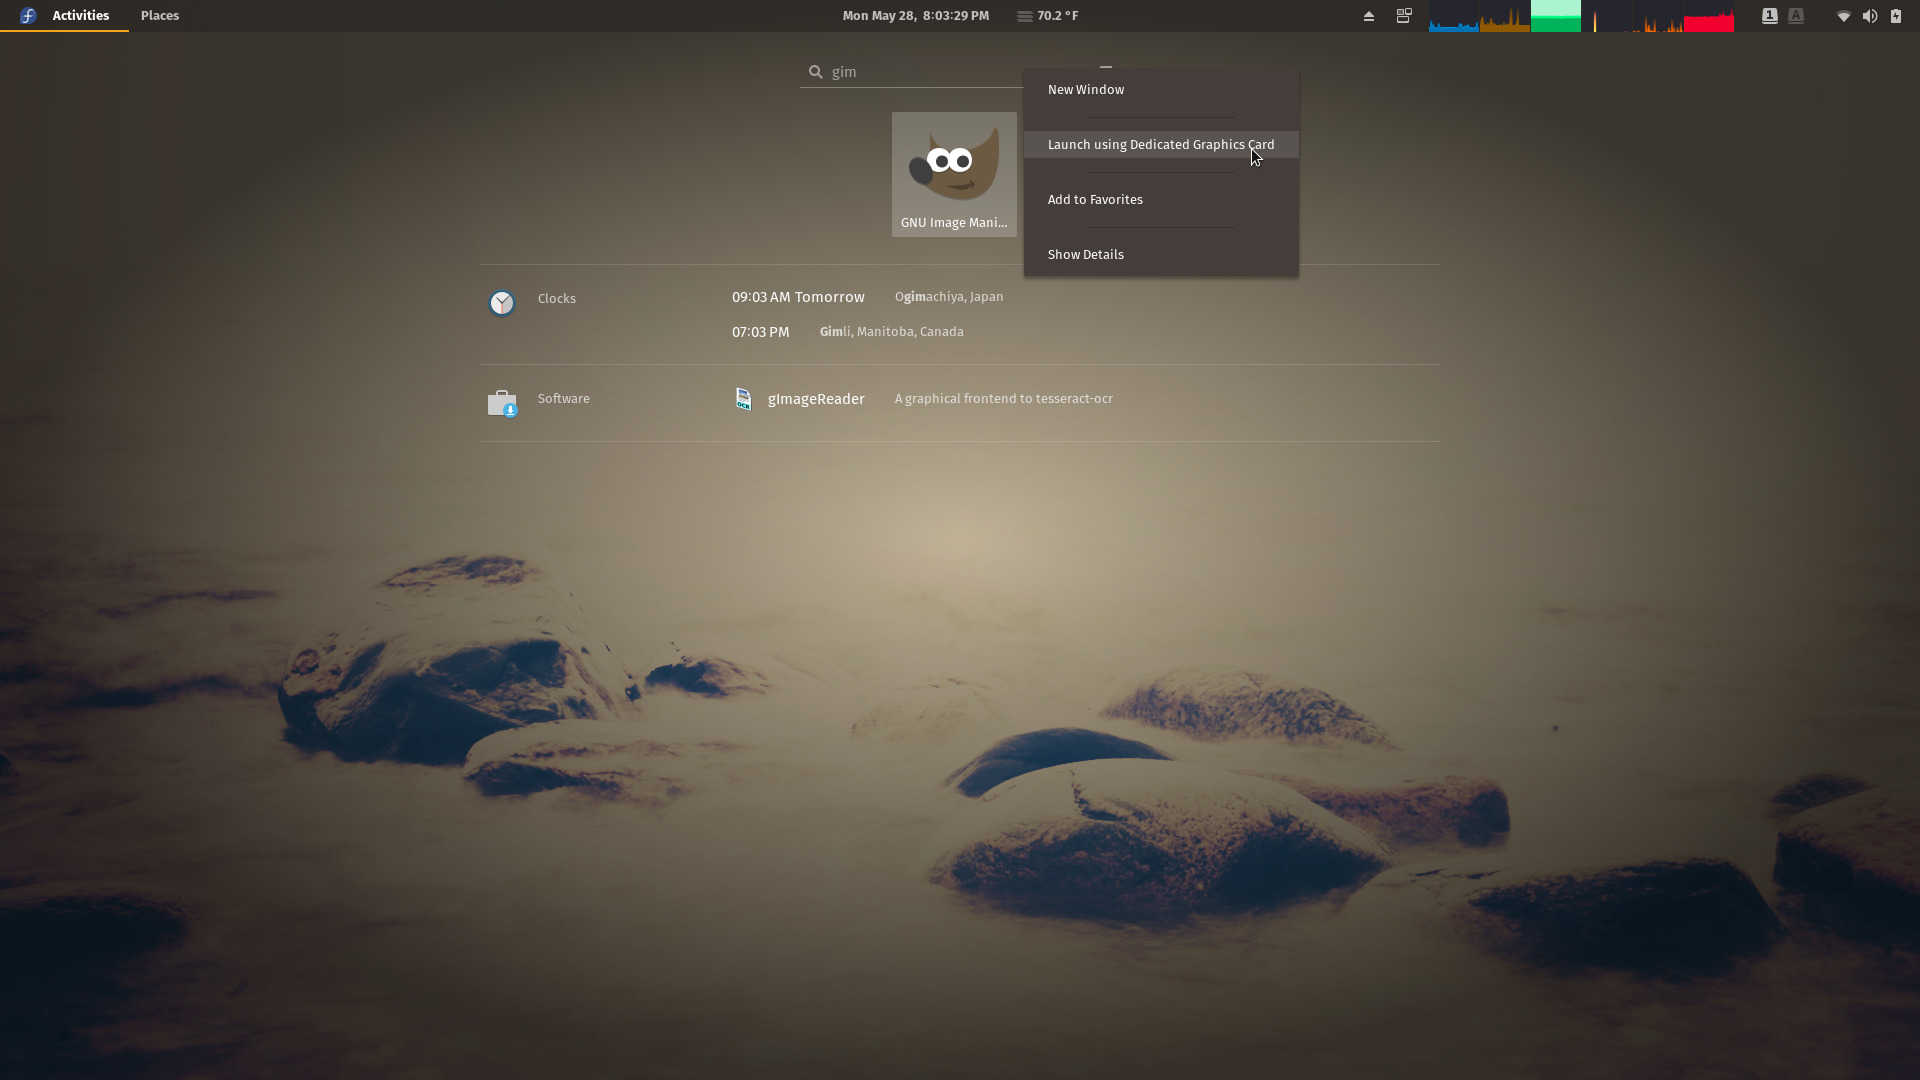 Fedora 28 Workstation Review | ORDINATECHNIC